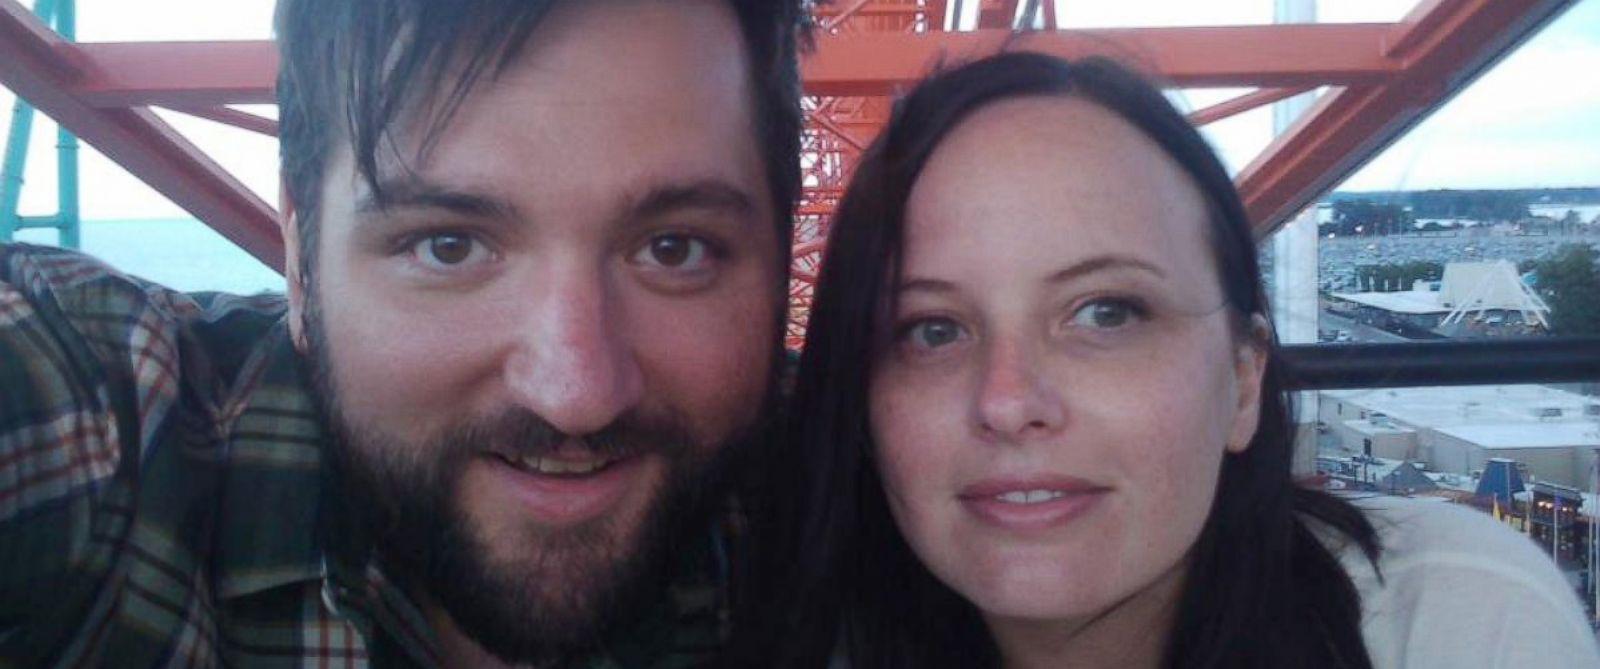 Ohio Man Shares Wife's Infertility Struggle to Encourage Other Couples